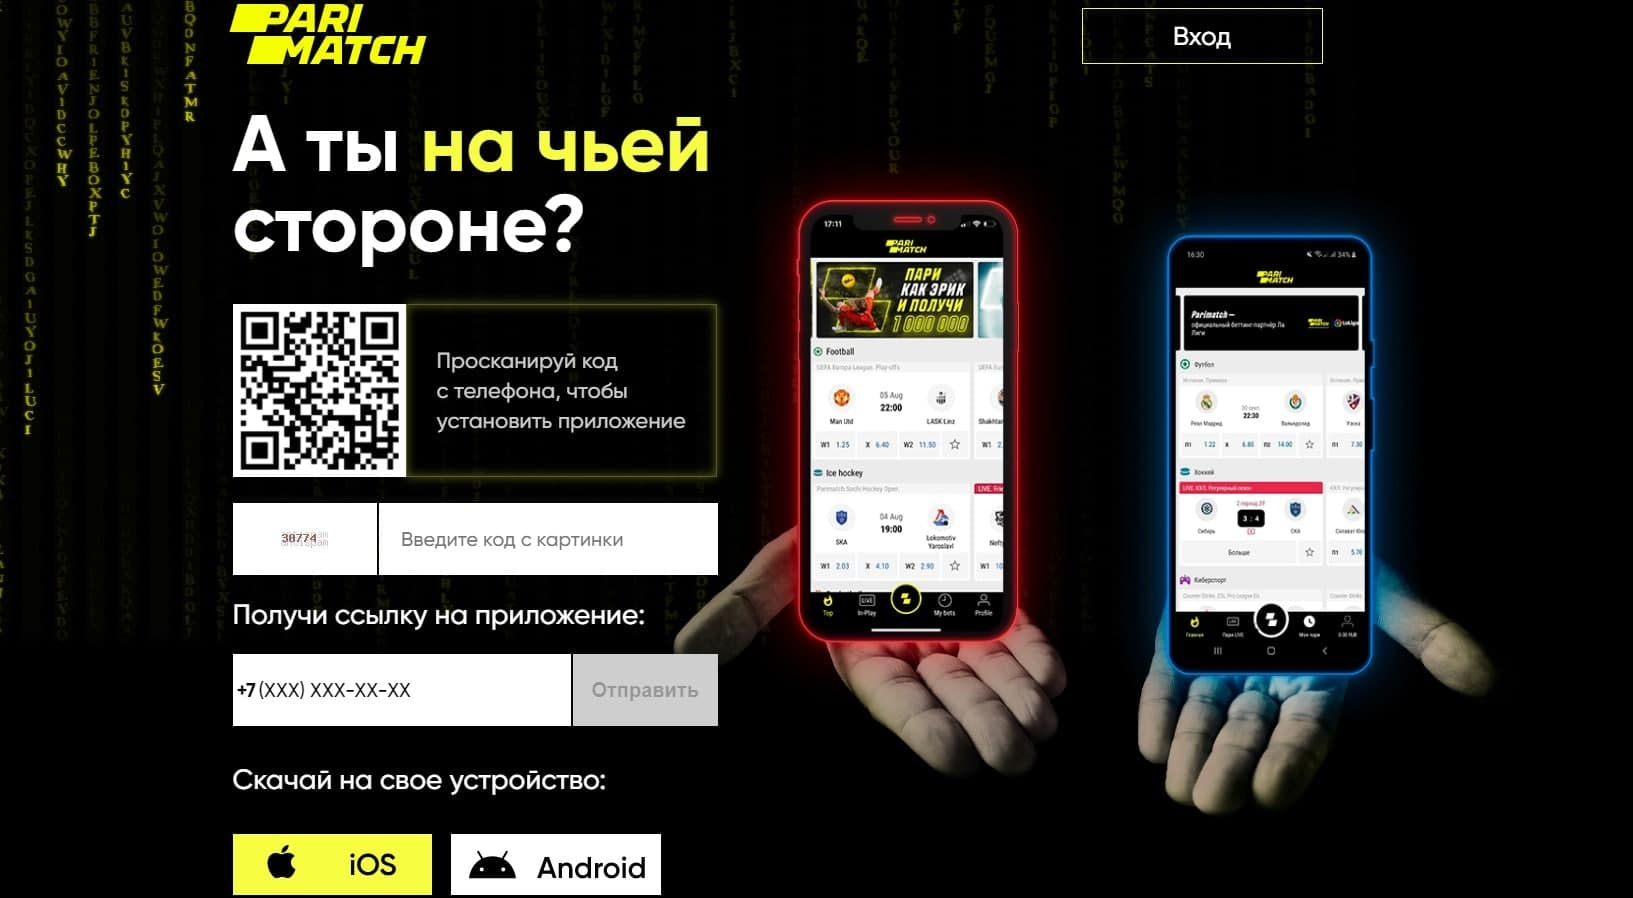 parimatch_prilojeniya